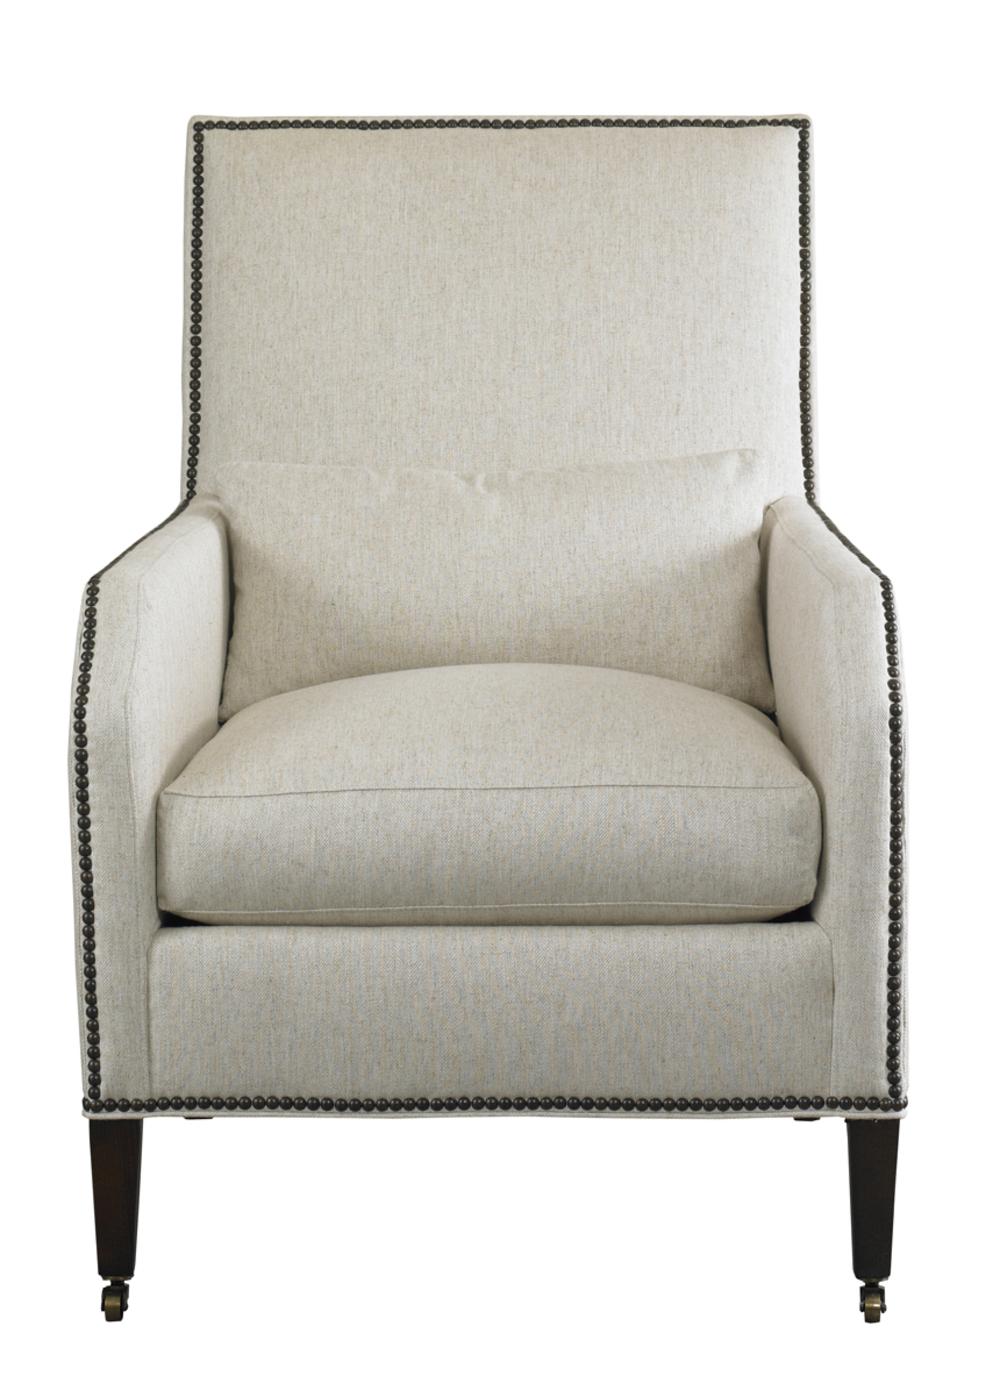 Lillian August Fine Furniture - Hendley Chair